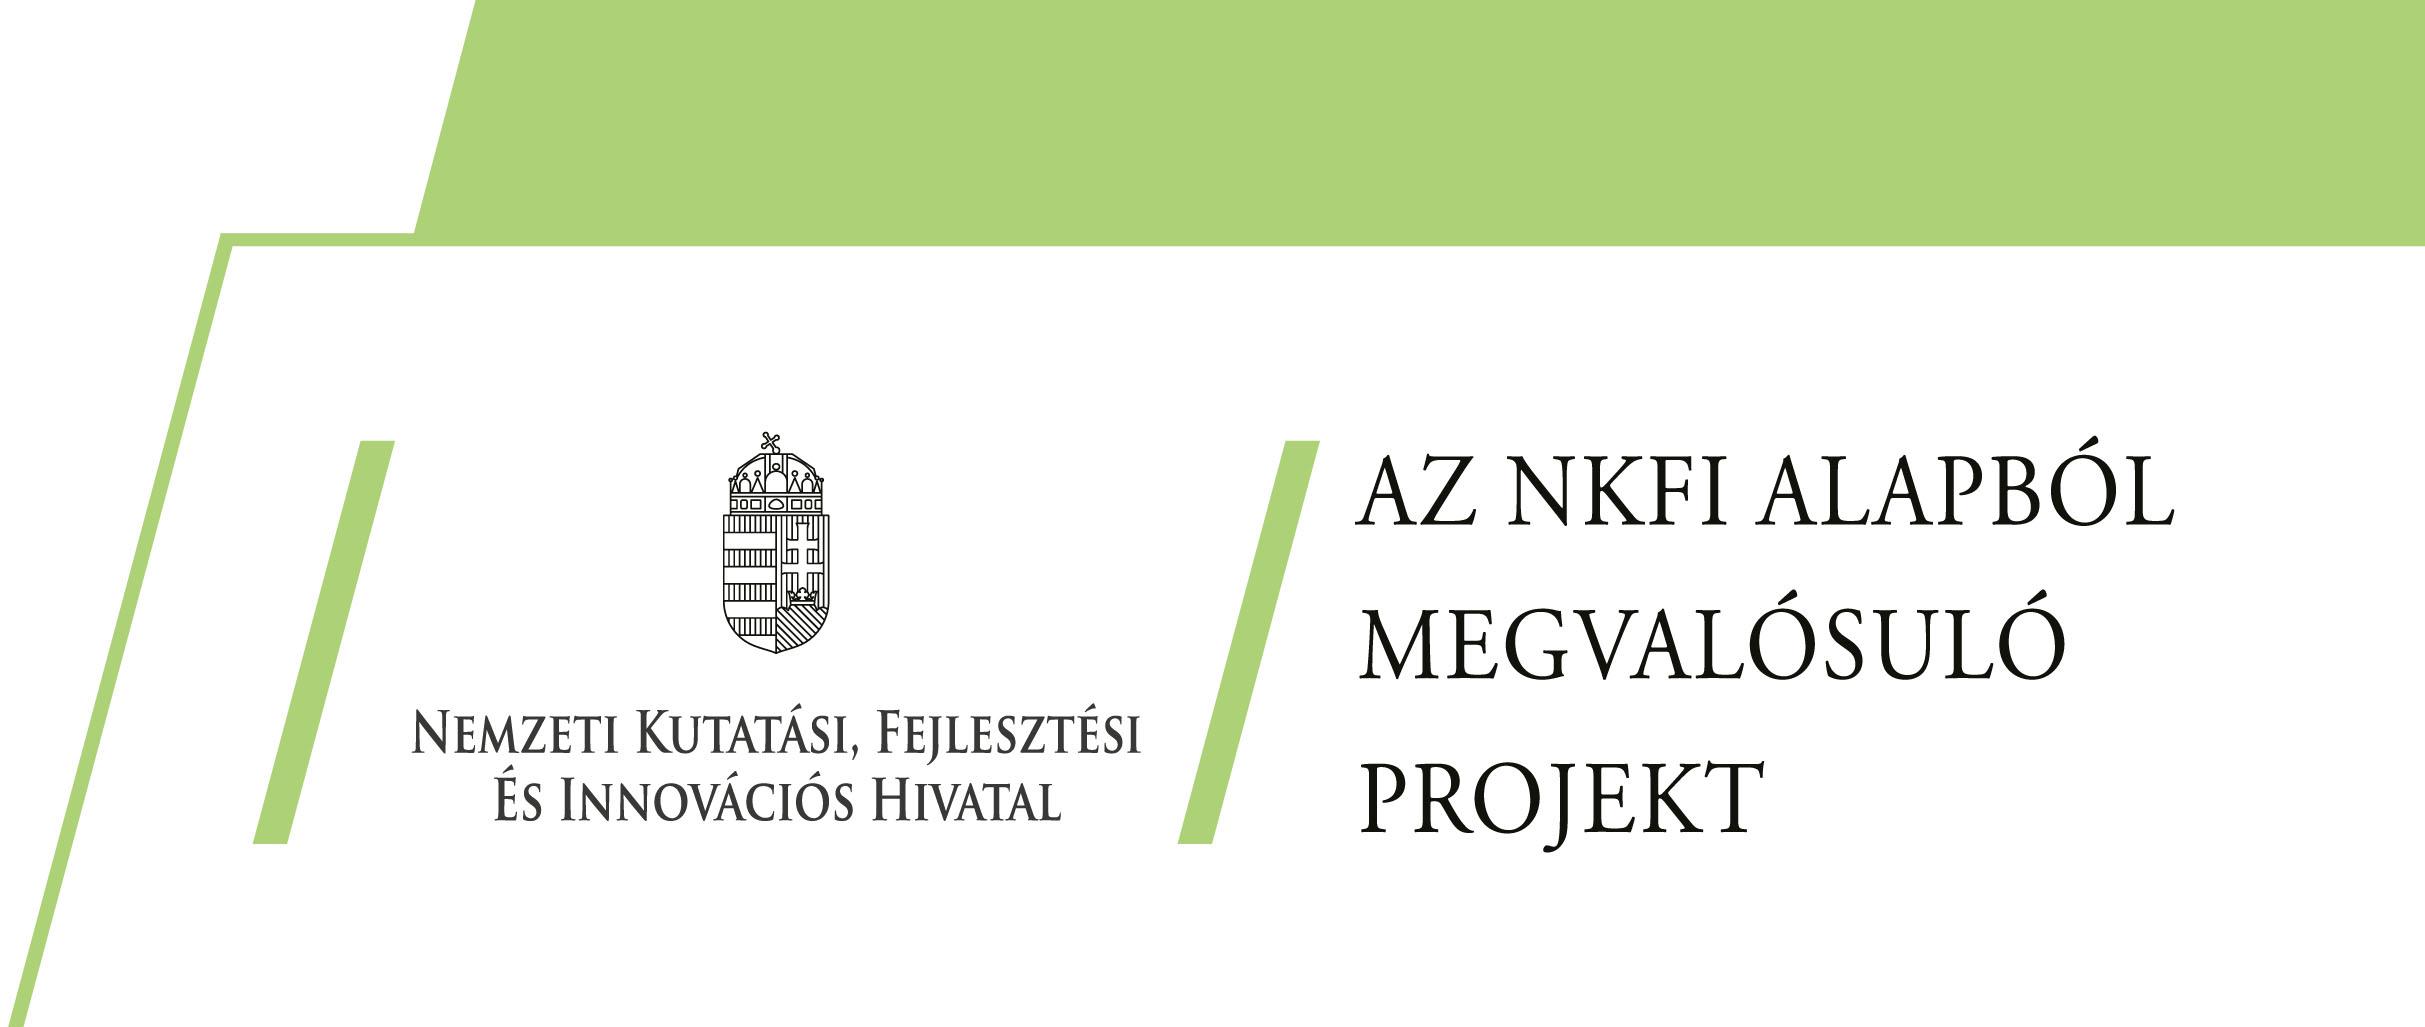 K+F pályázat EBH INVEST Kft.